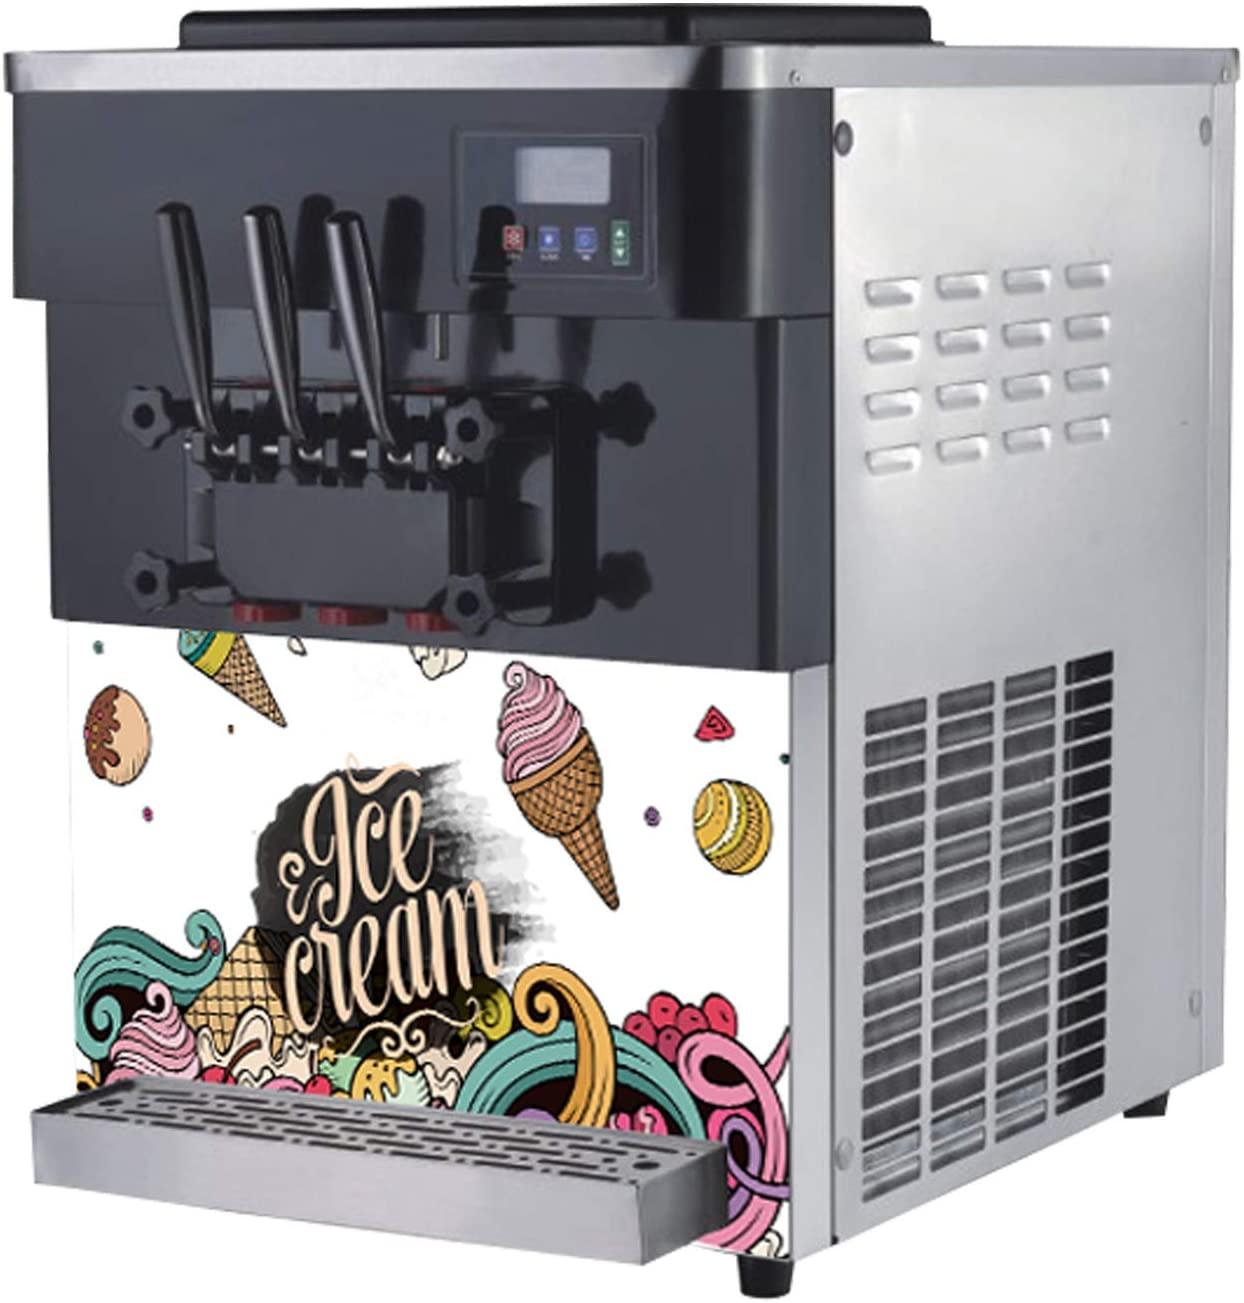 Ice Cream Maker Machine for Soft Serve, Frozen Yogurt, Sorbet, Gelato, Custard – LCD Screen & 3 Flavors (2 Individual & 1 Mix) – For Restaurants, Snack Bars, Cafes, Bakeries - 50-Quart Output HALF PRICE AMAZON ONLY SALE